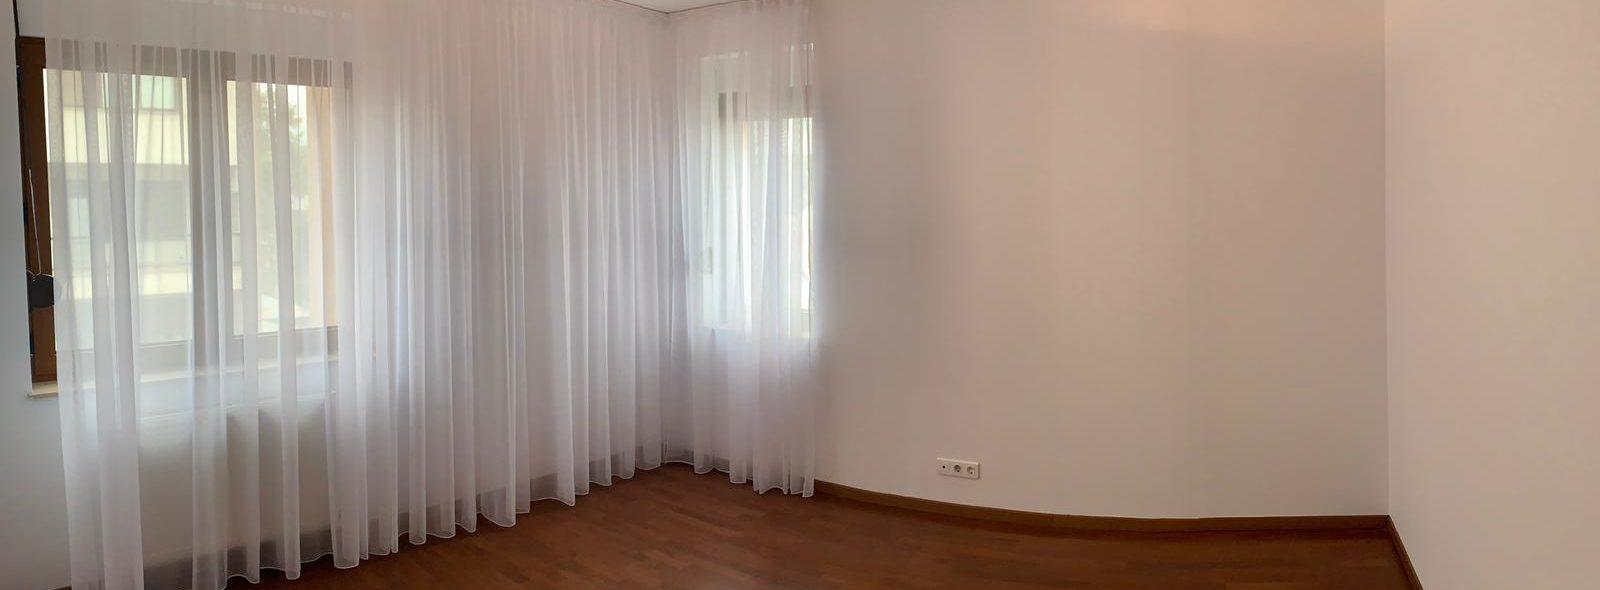 Inchiriere Apartament 3 camere Bucuresti, Ion Mihalache (1 Mai) poza principala